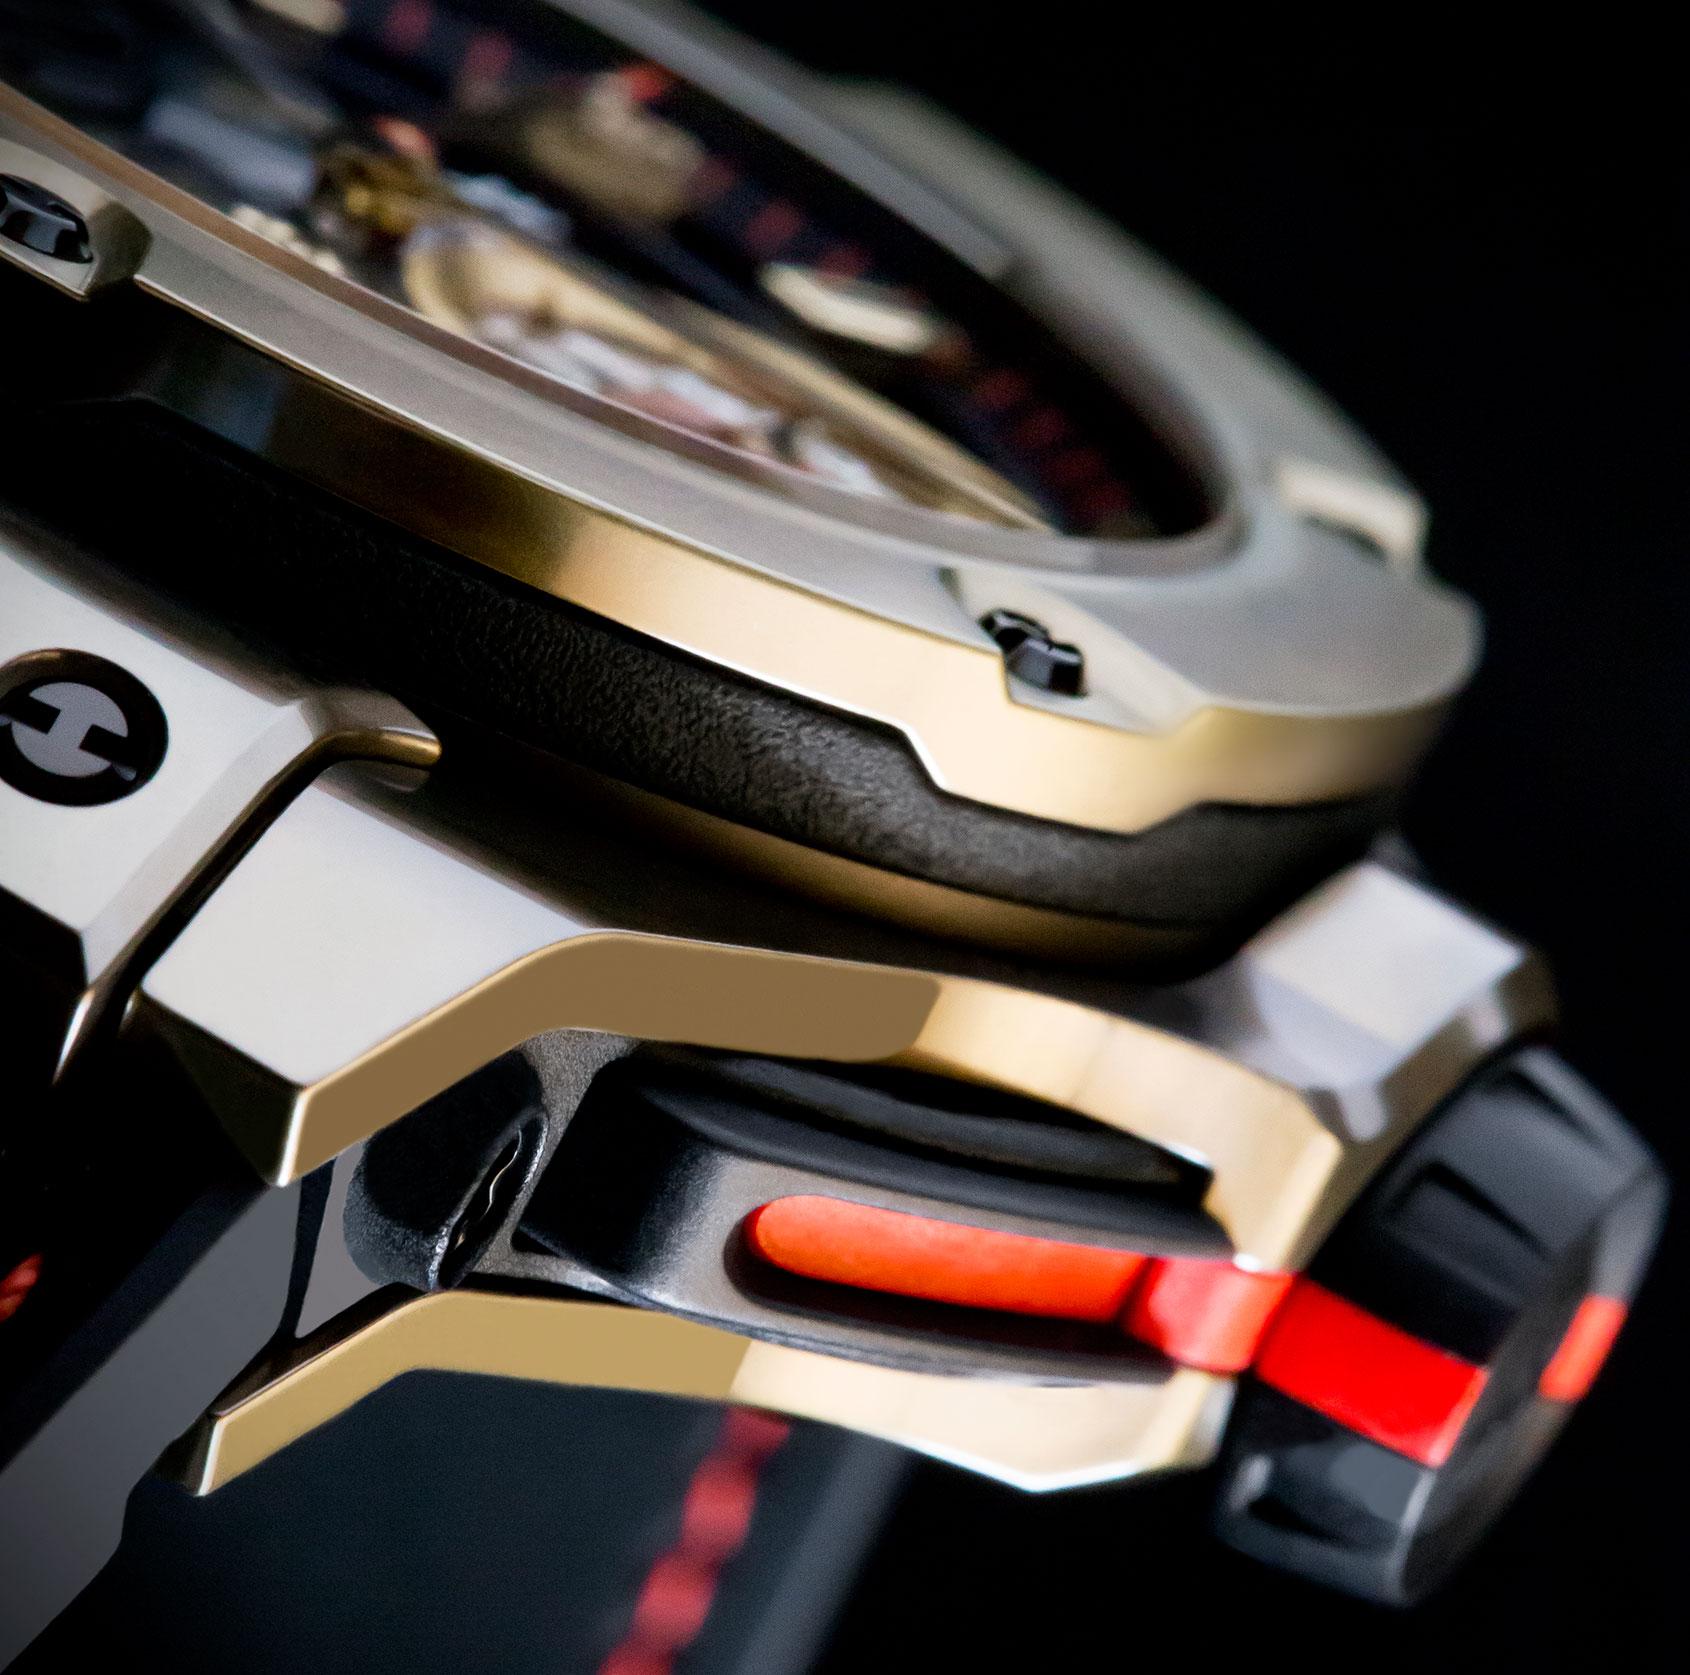 INTRODUCING: The harder, faster, stronger Hublot Big Bang Ferrari in Magic Gold